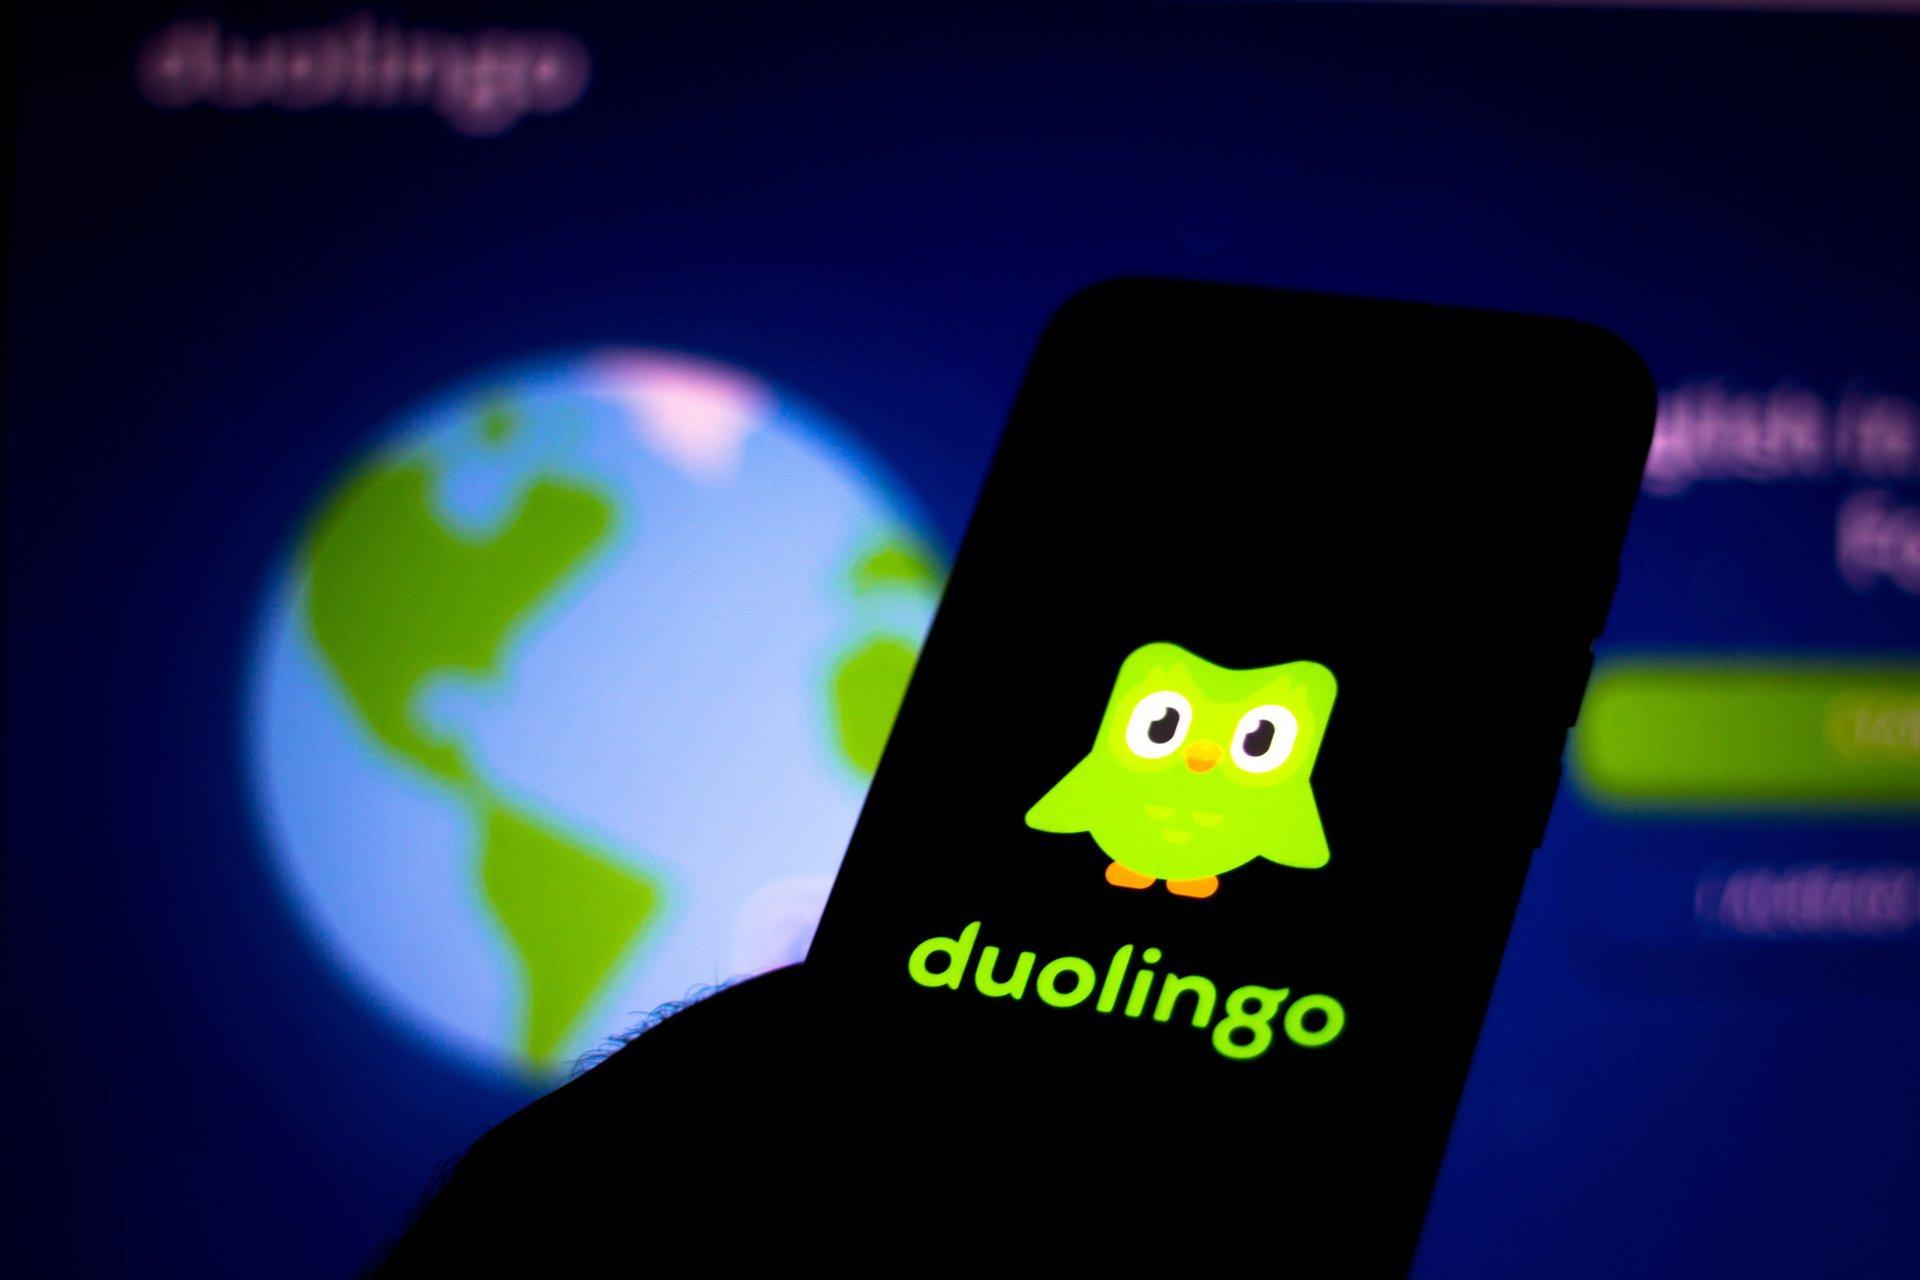 Plataforma Duolingo